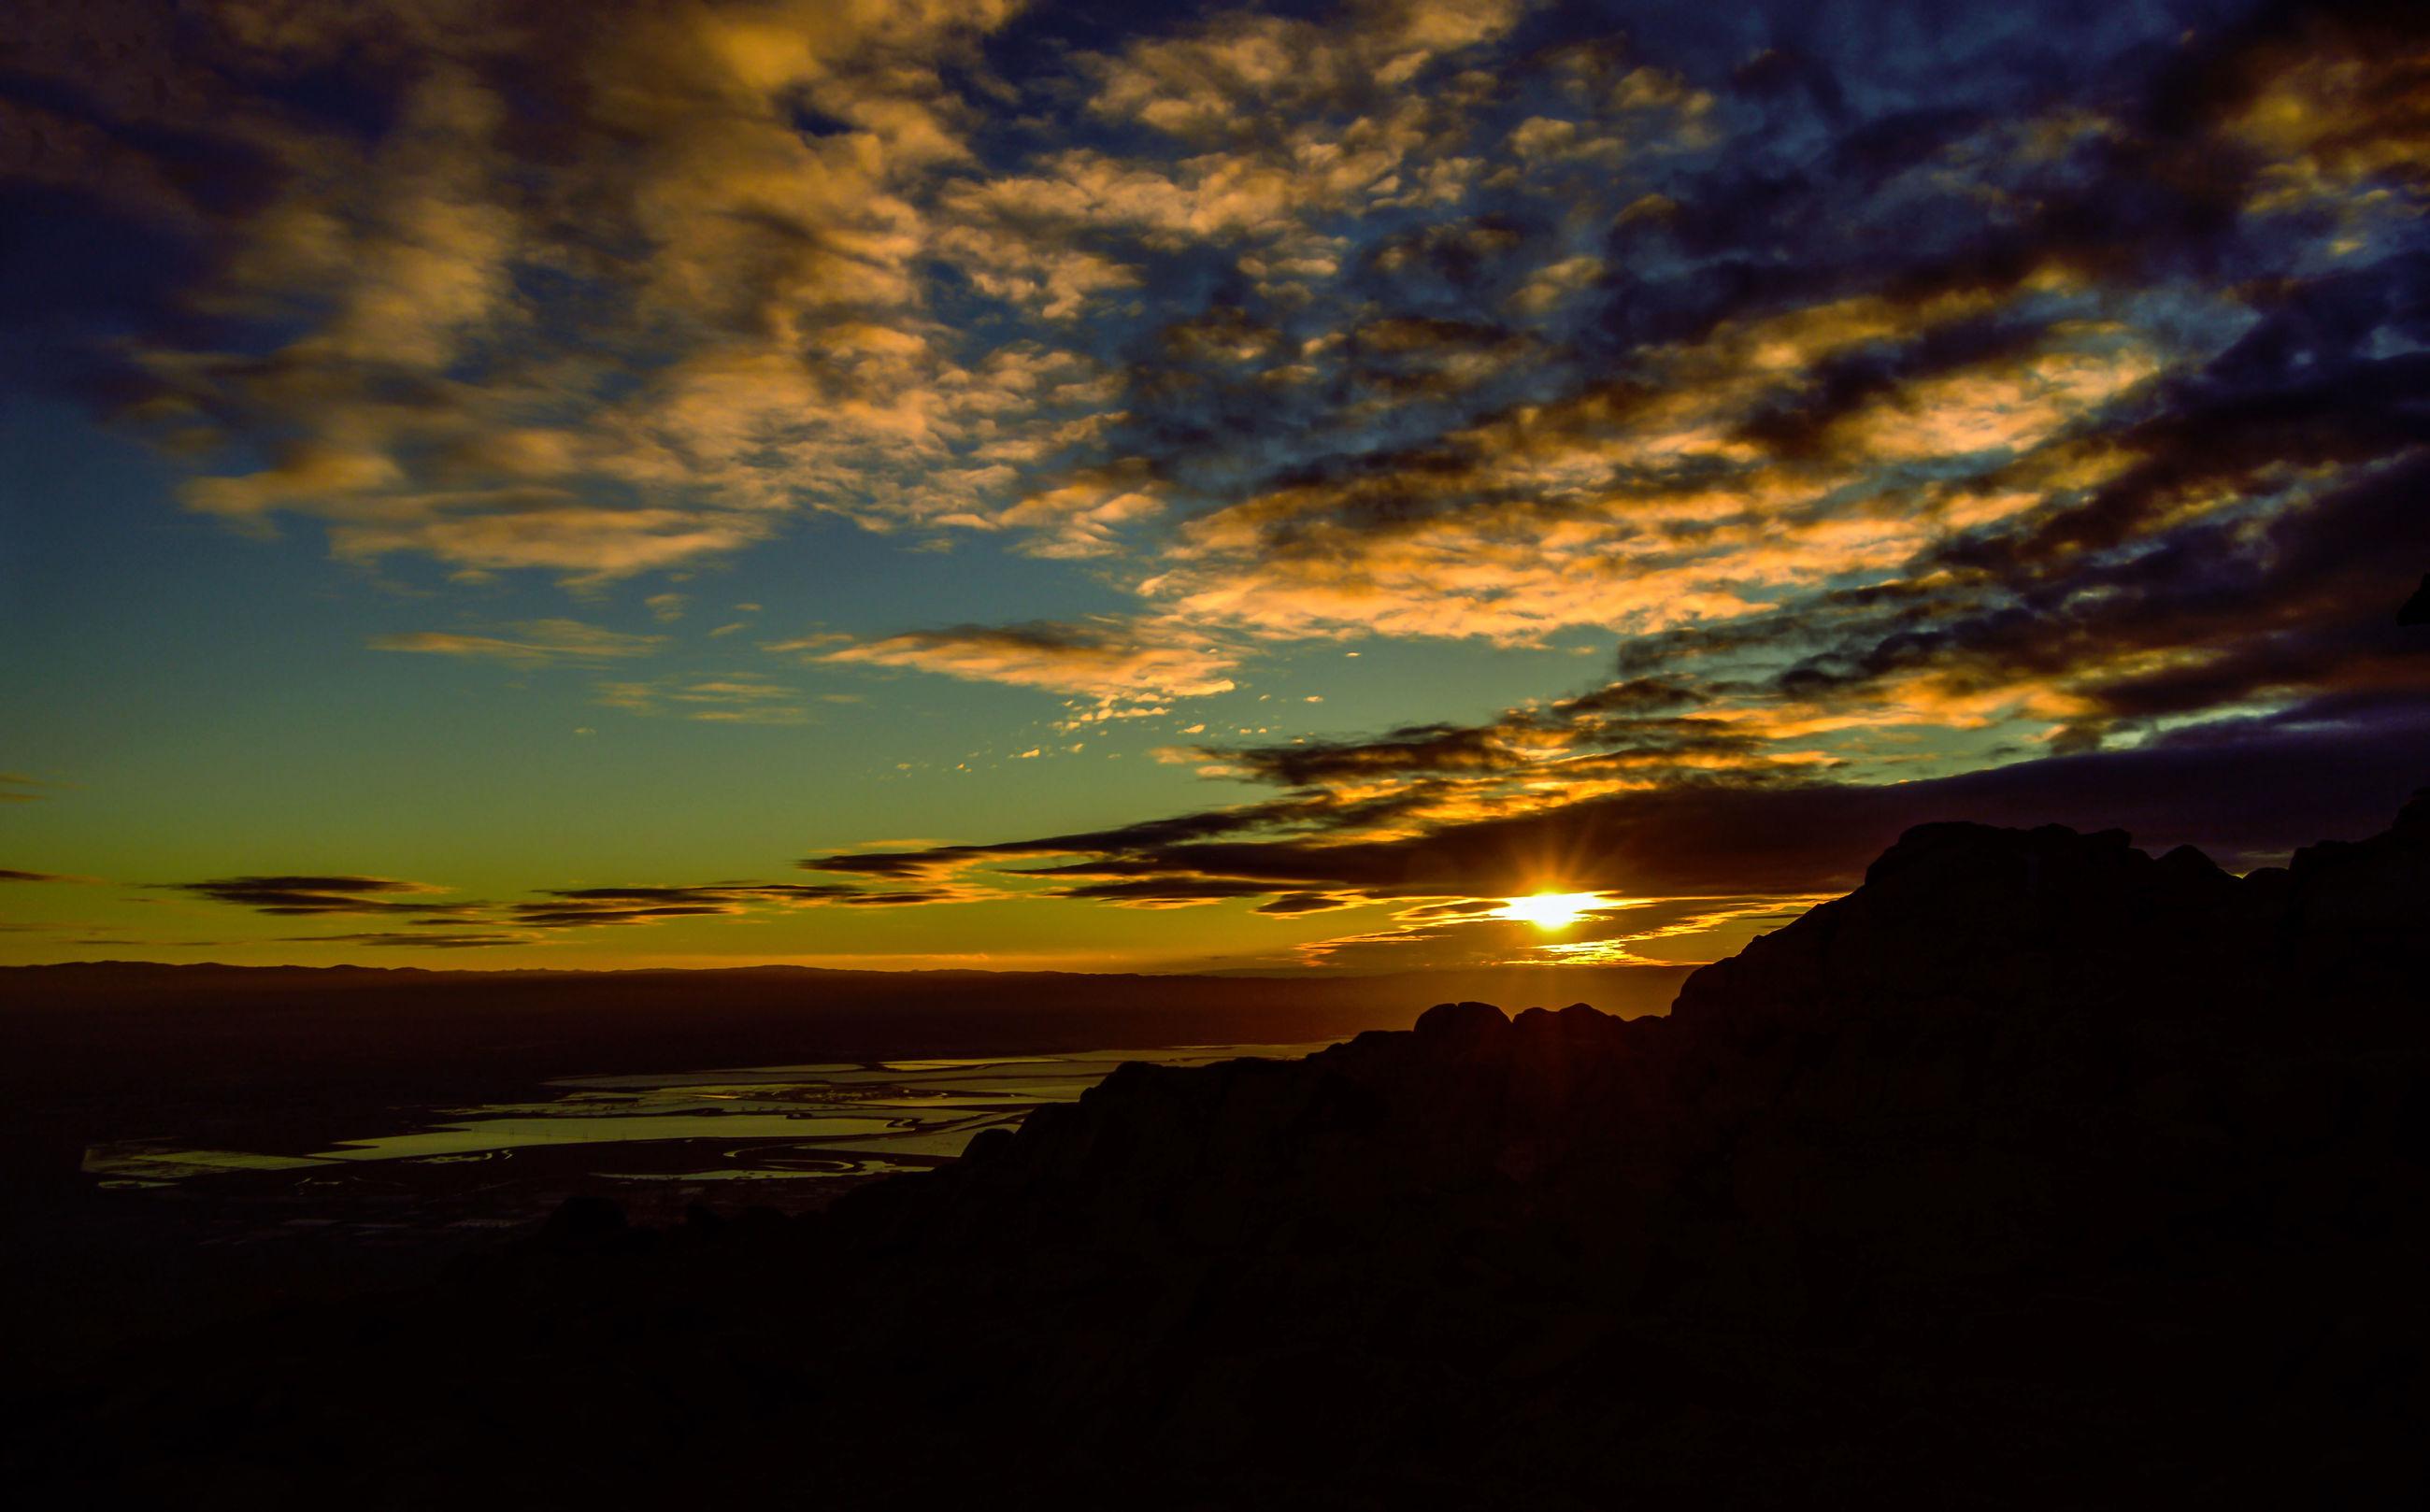 sunset, scenics, silhouette, tranquil scene, sky, beauty in nature, tranquility, cloud - sky, idyllic, orange color, dramatic sky, nature, cloud, dark, majestic, moody sky, cloudy, landscape, atmospheric mood, sun